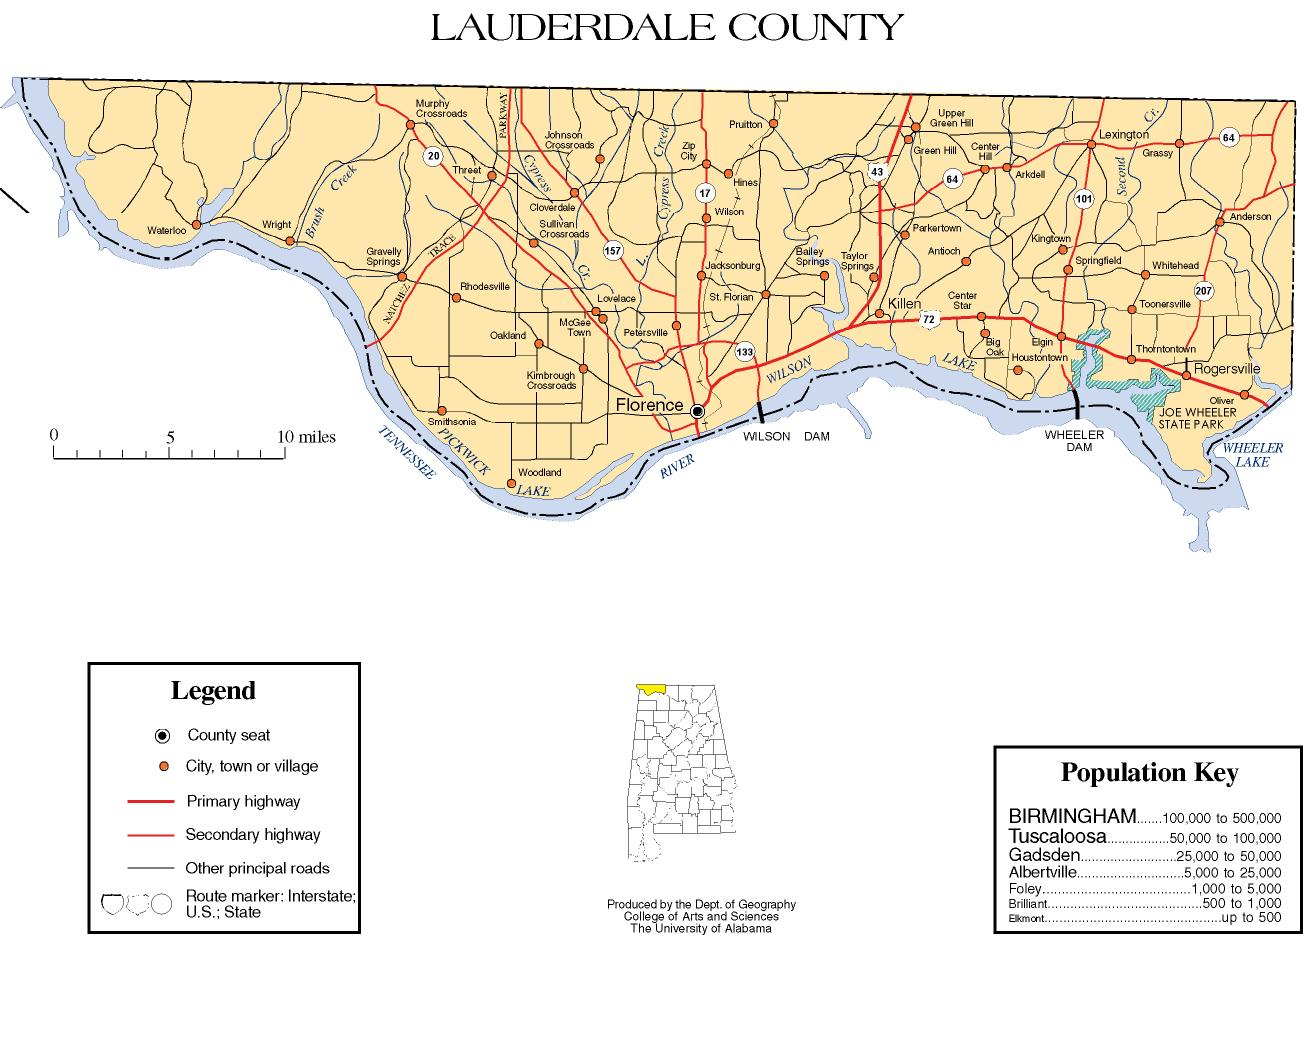 Lauderdale County, Alabama history, ADAHlauderdale county